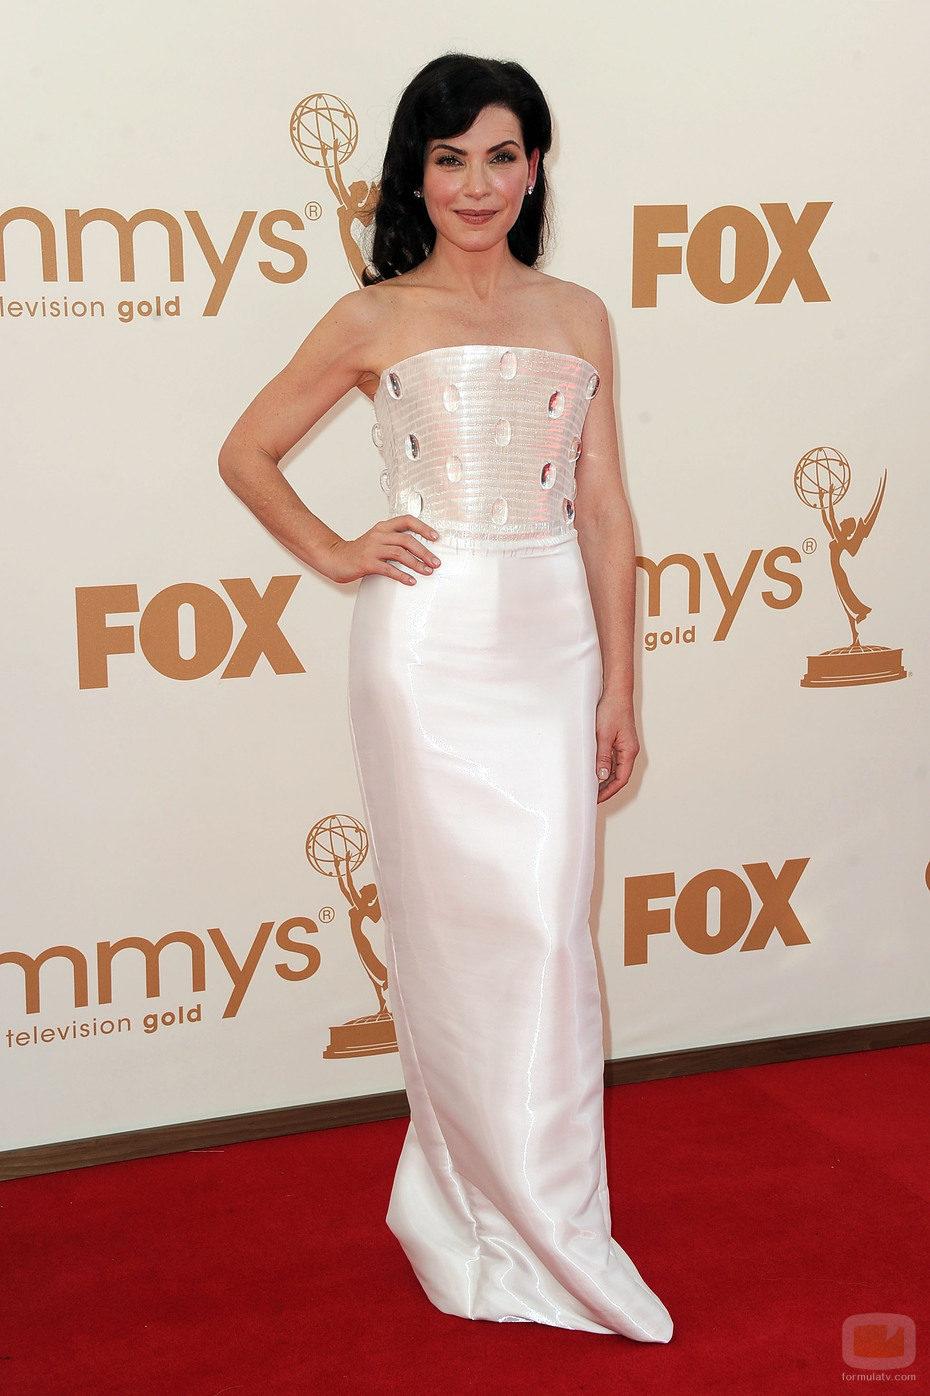 Julianna Margulies en la Alfombra Roja de los Emmy 2011